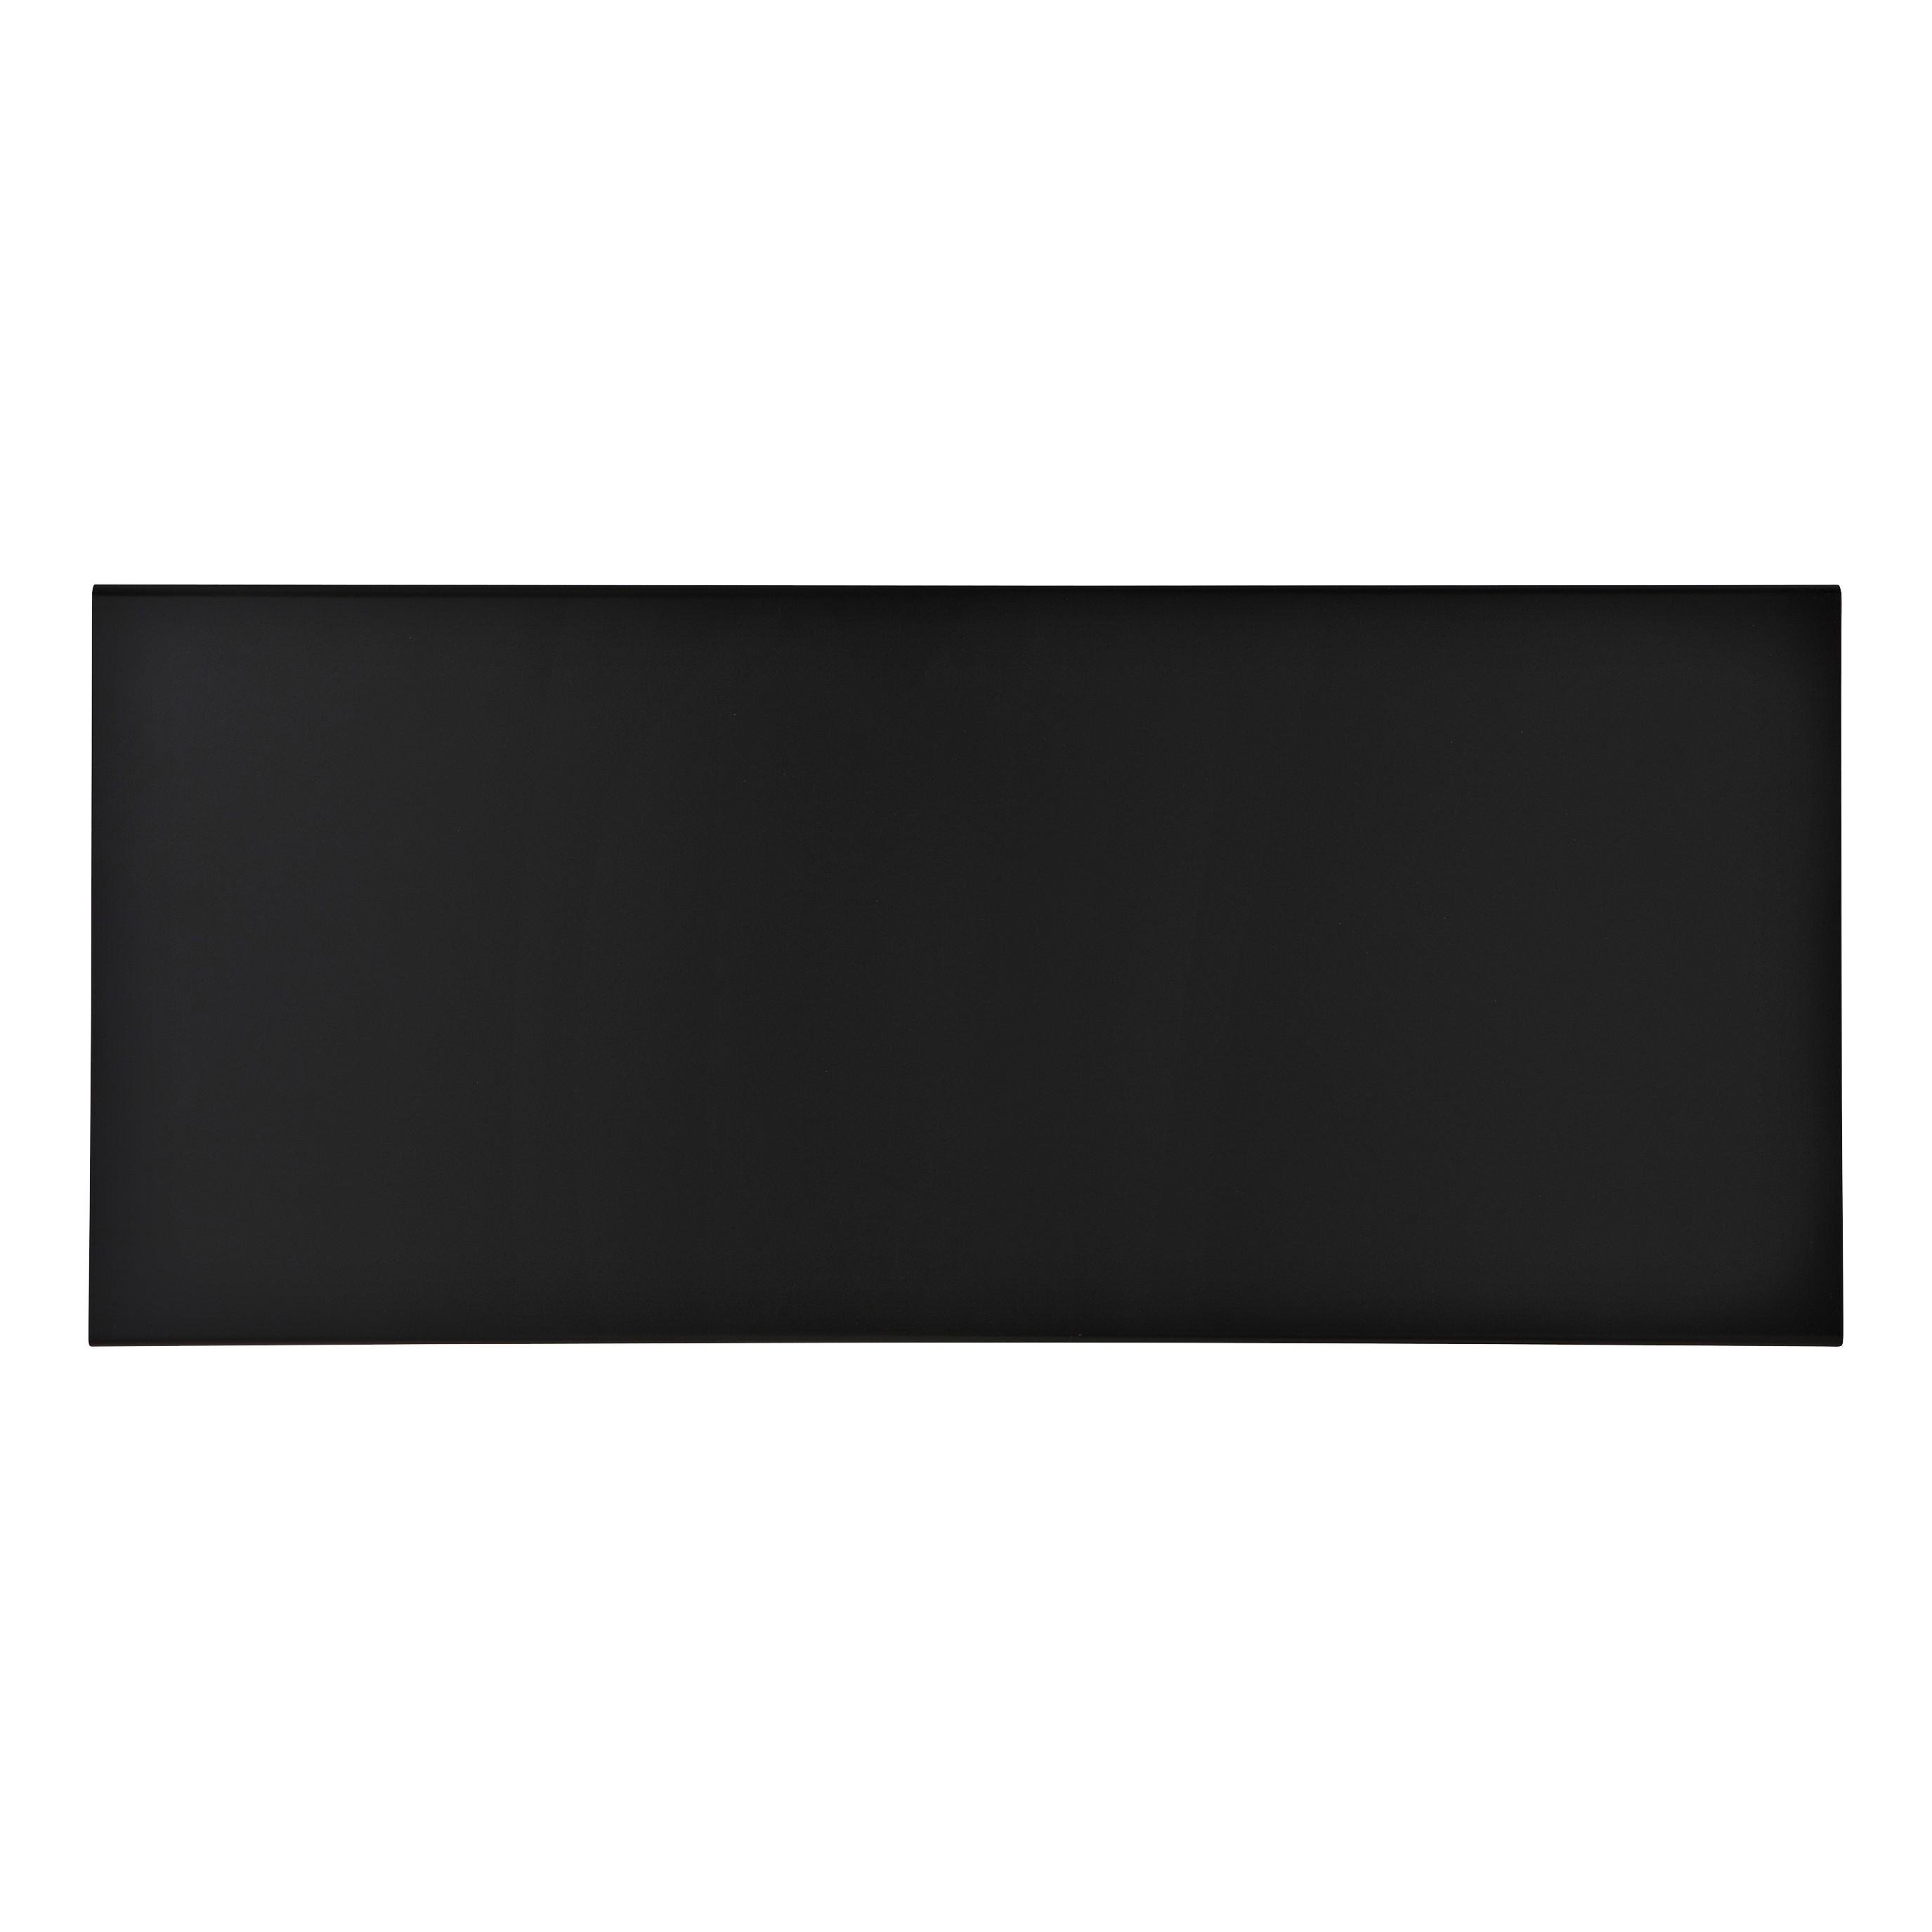 410244 : Adax Neo panelovn m/WiFi H 10 (perlesort)